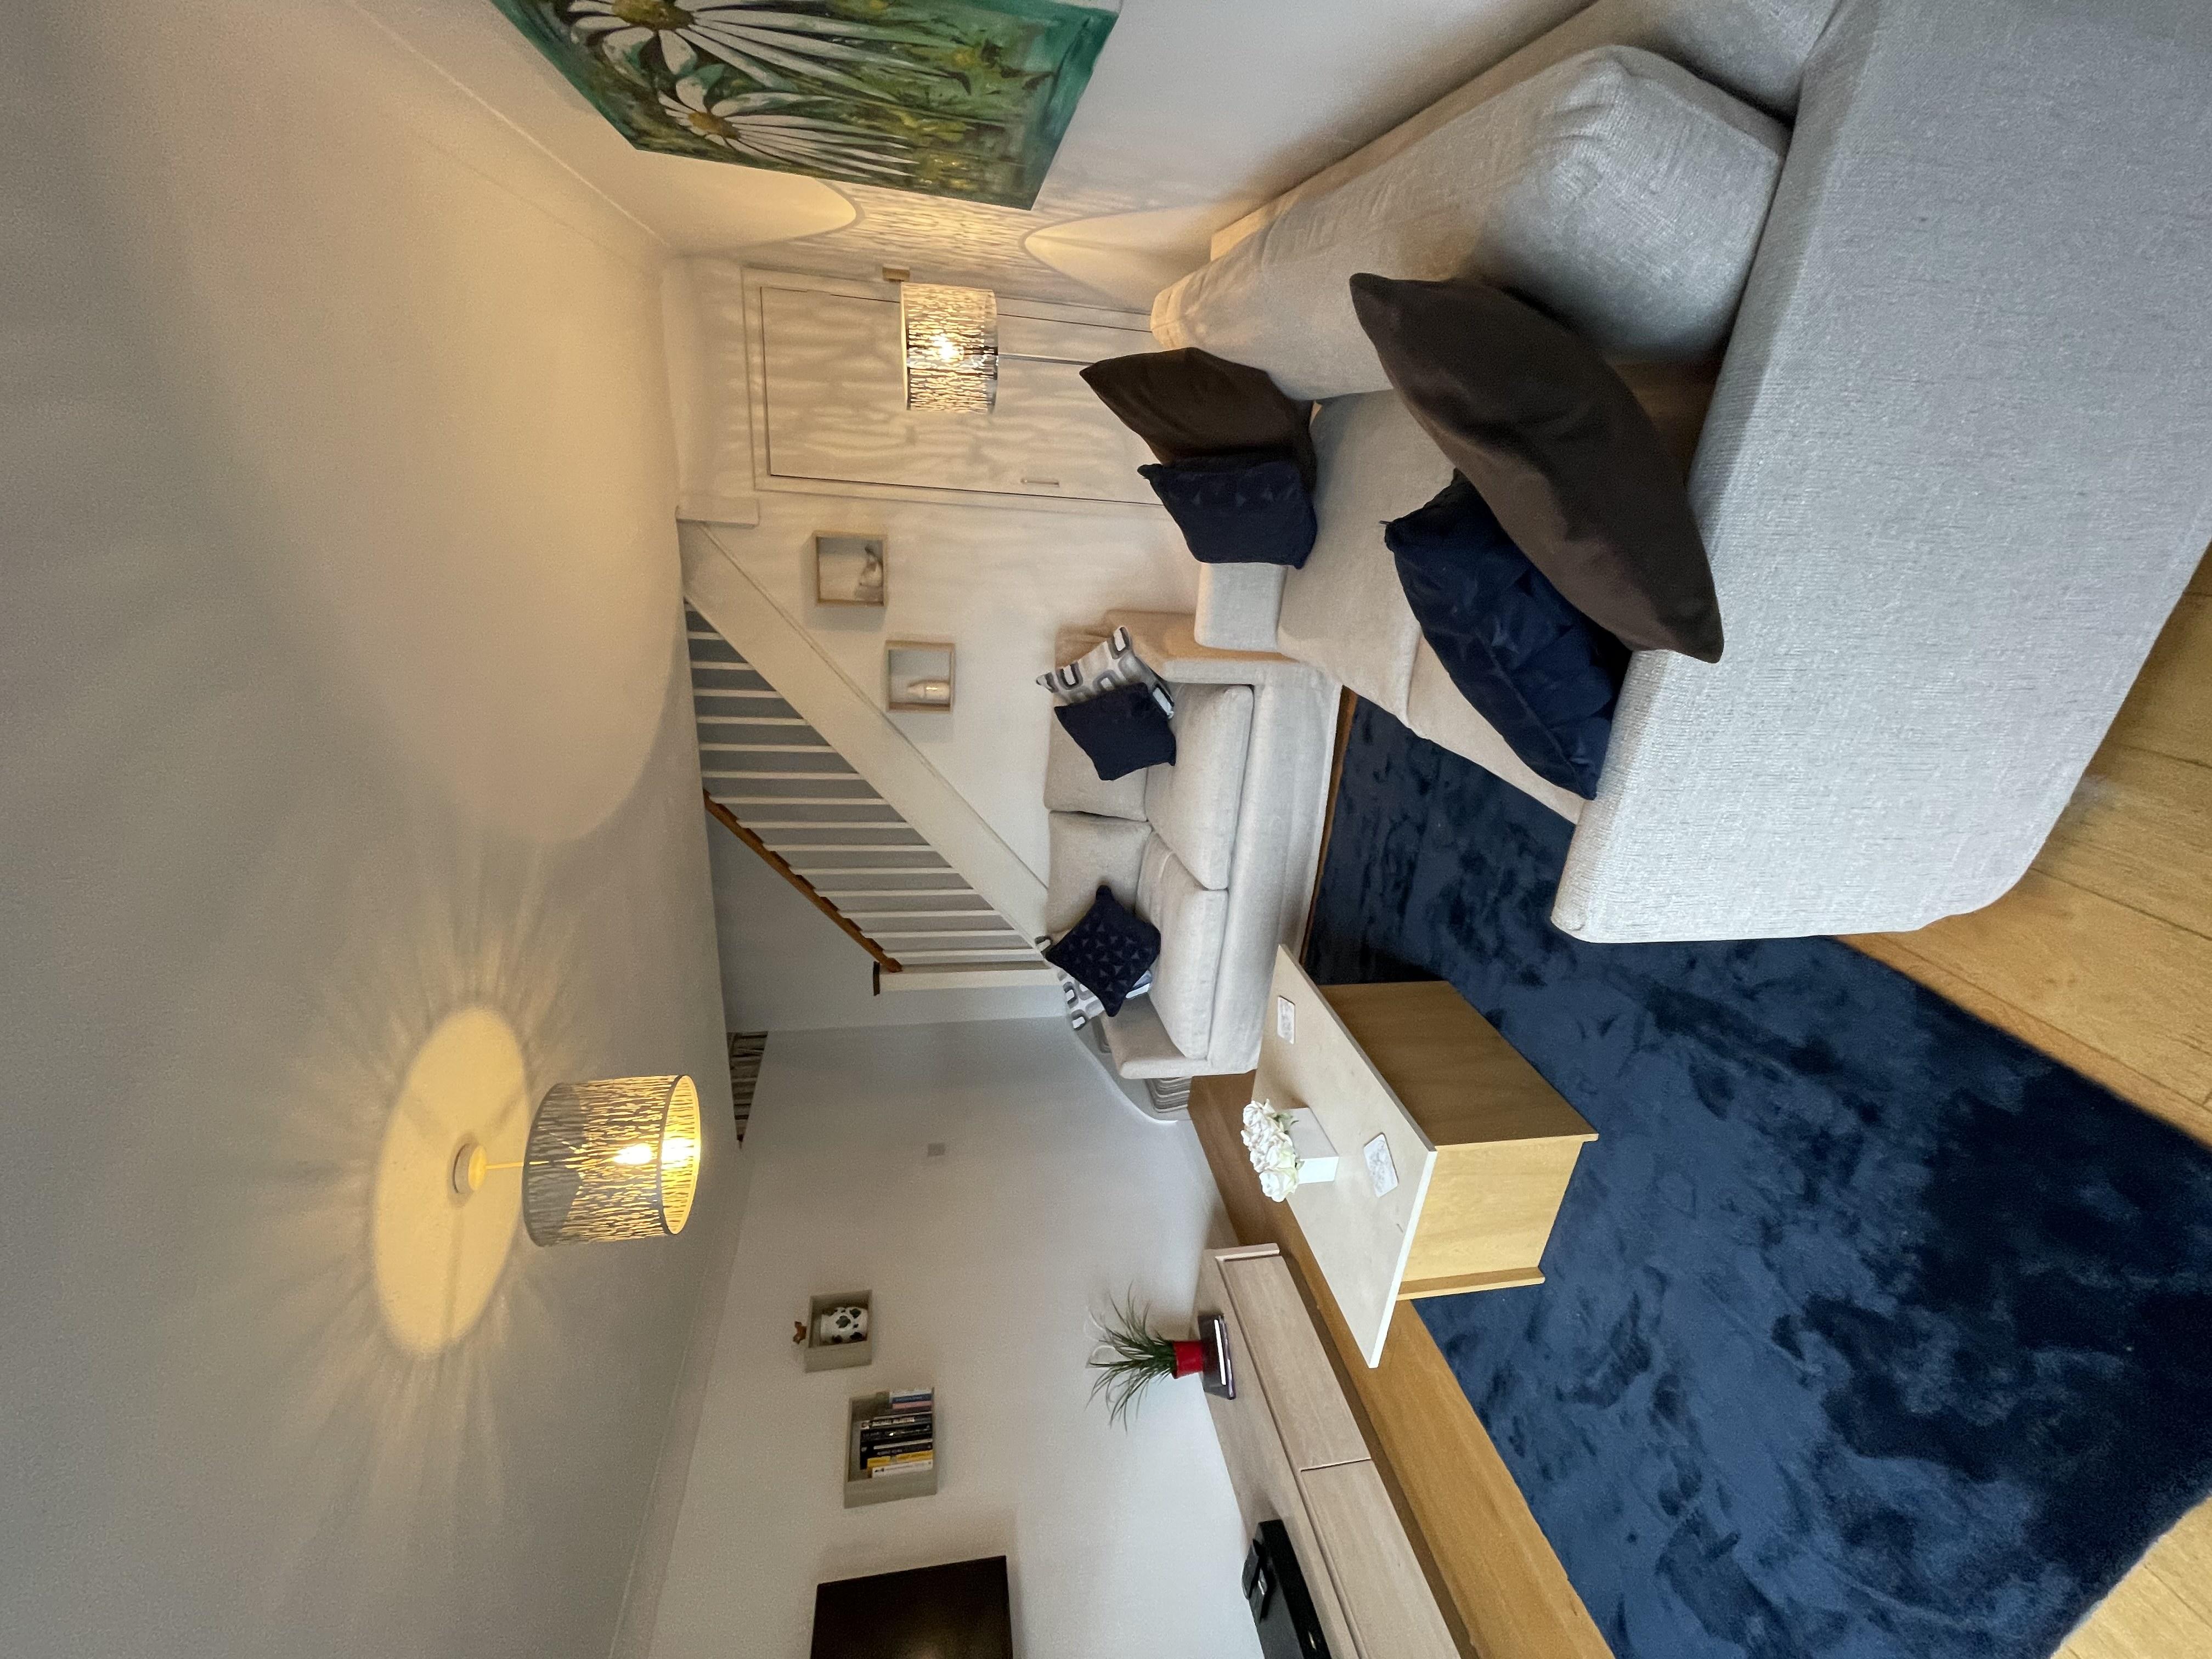 IMG_4679.jpg house lounge